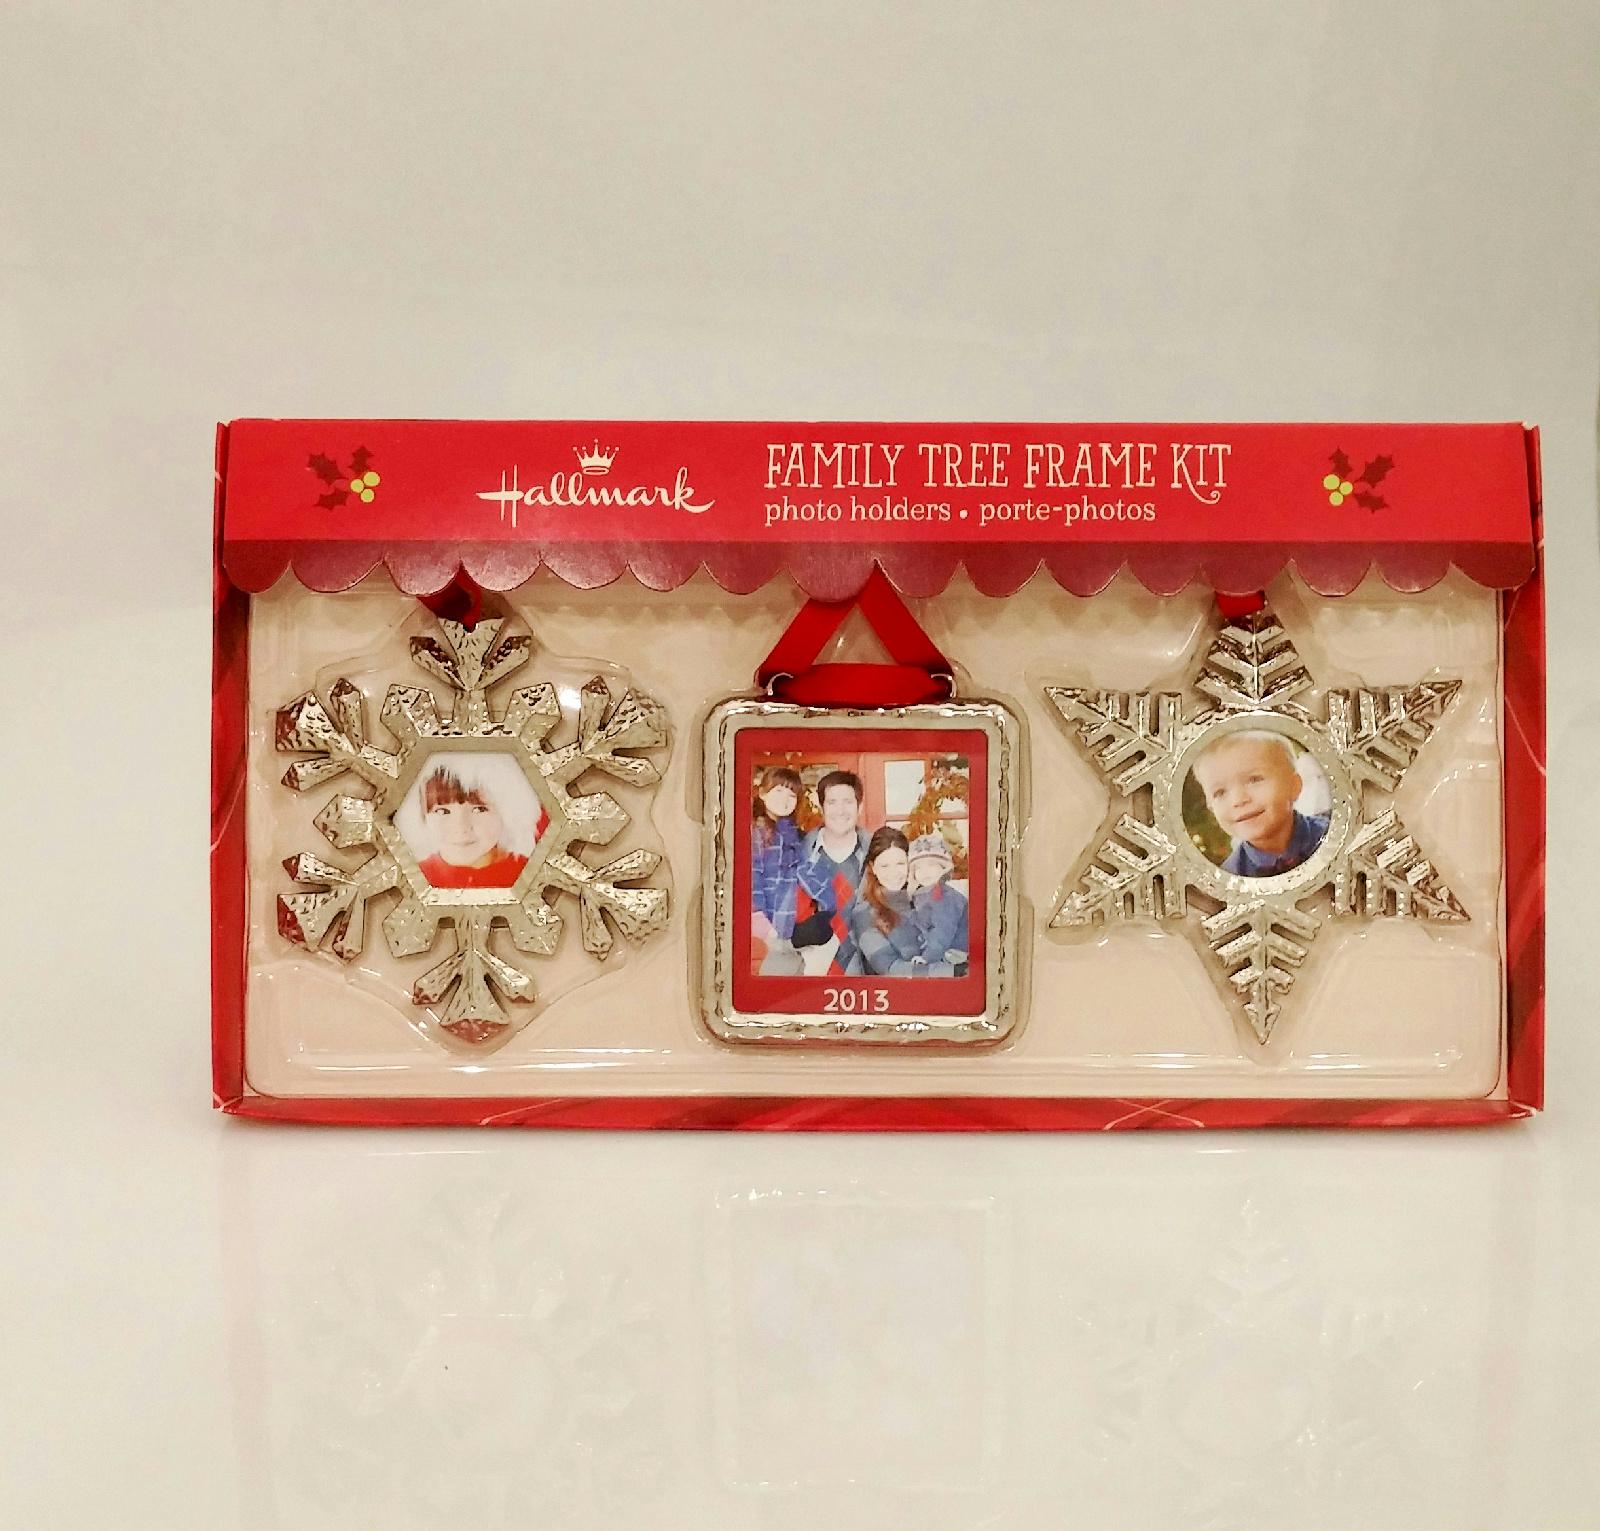 hallmark 2013 christmas silver holiday family tree photo frame kit ftf6004 ebay. Black Bedroom Furniture Sets. Home Design Ideas